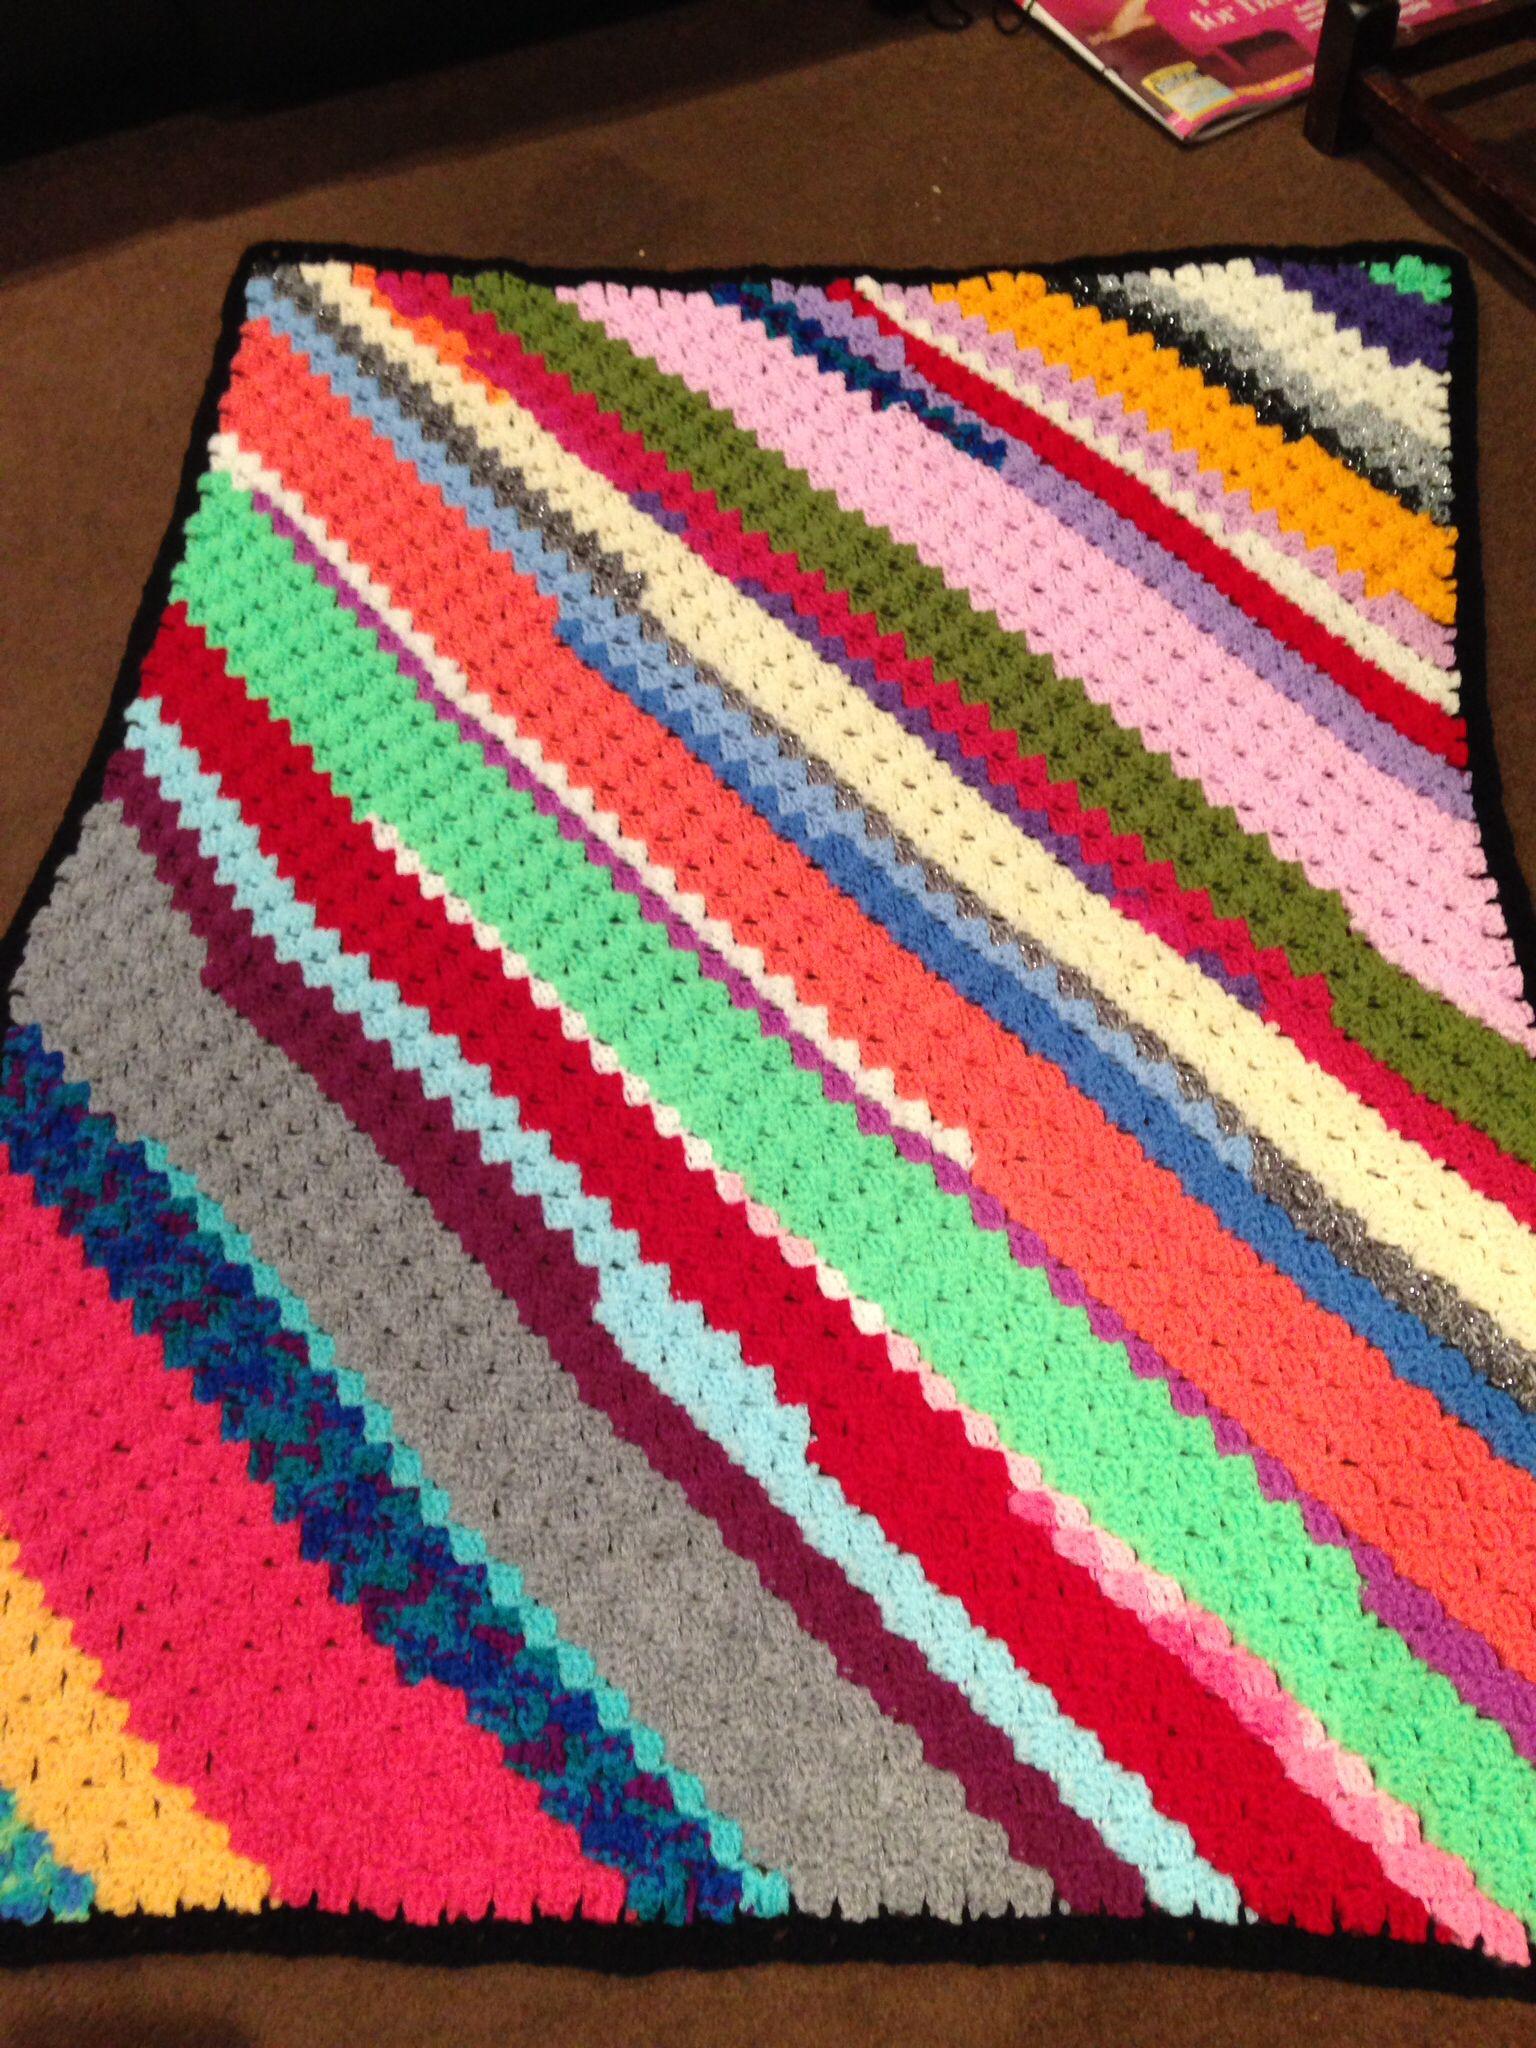 A Rectangular C2c Scrapghan Crochet Patterns Free